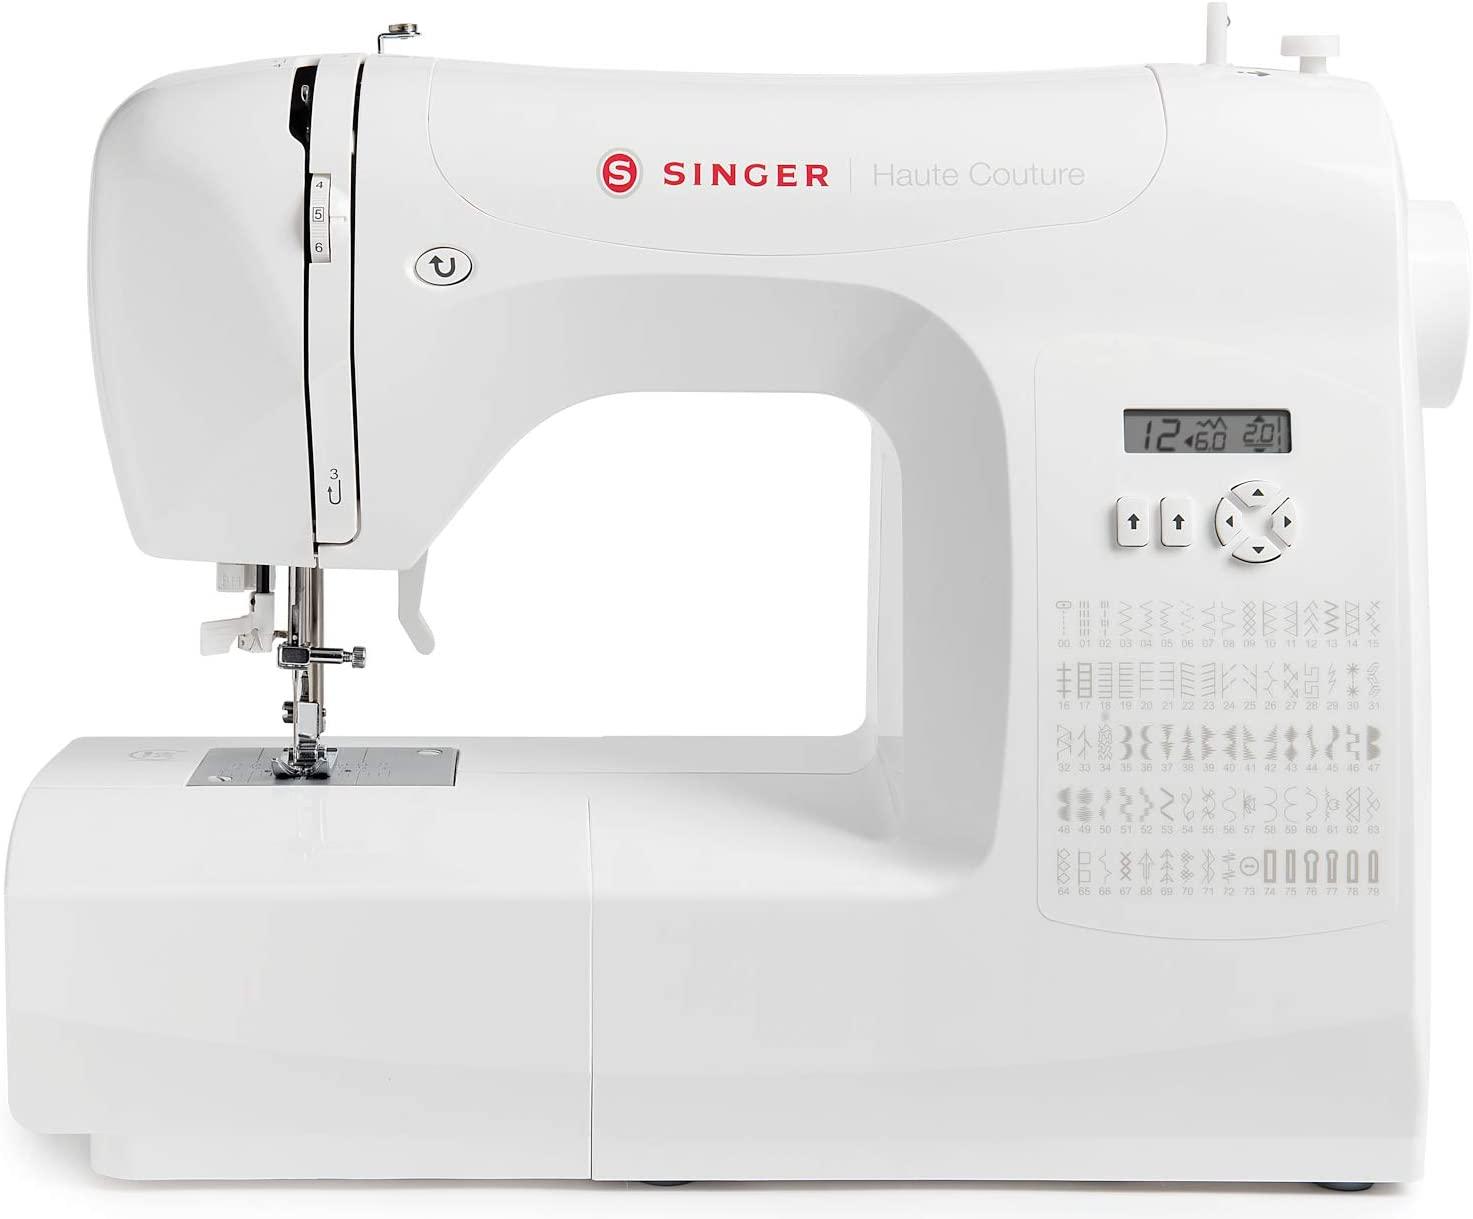 Singer Haute Couture - Máquina de coser electrónica de edición exclusiva, 80 puntos de costura, portátil, eléctrica, profesional, automática, costura creativa, fácil para principiantes